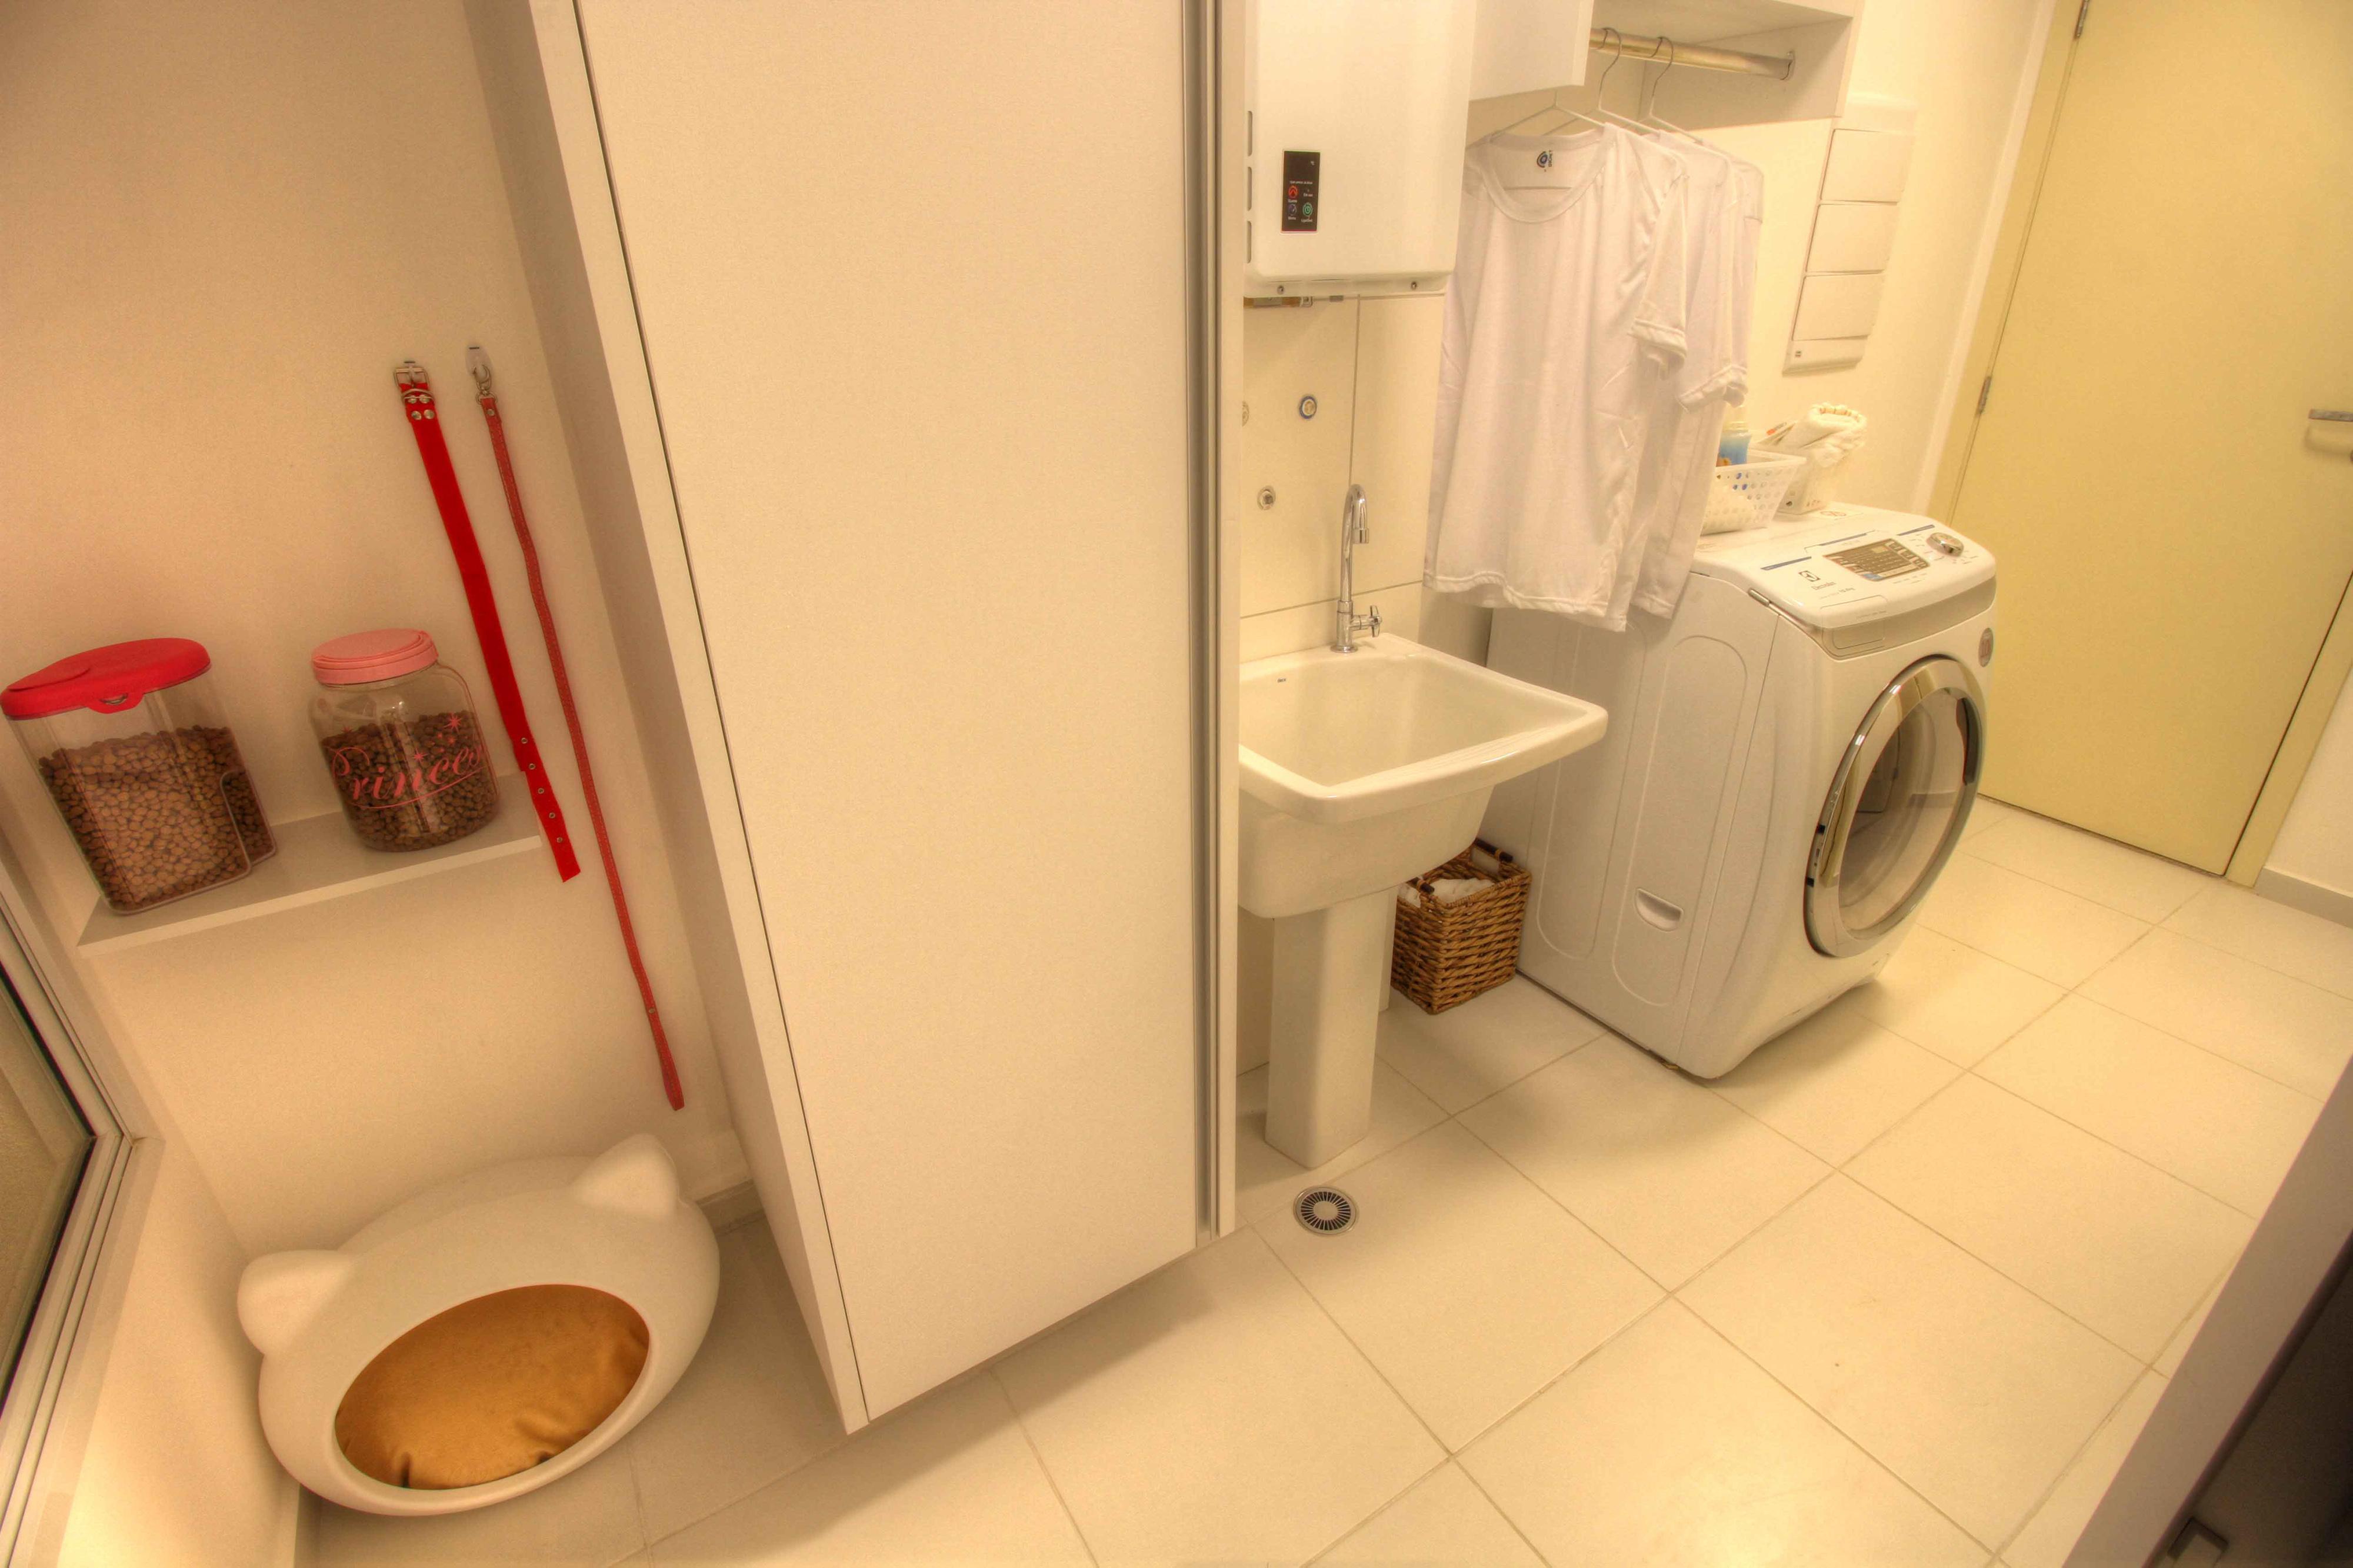 133 m² - Área de serviço